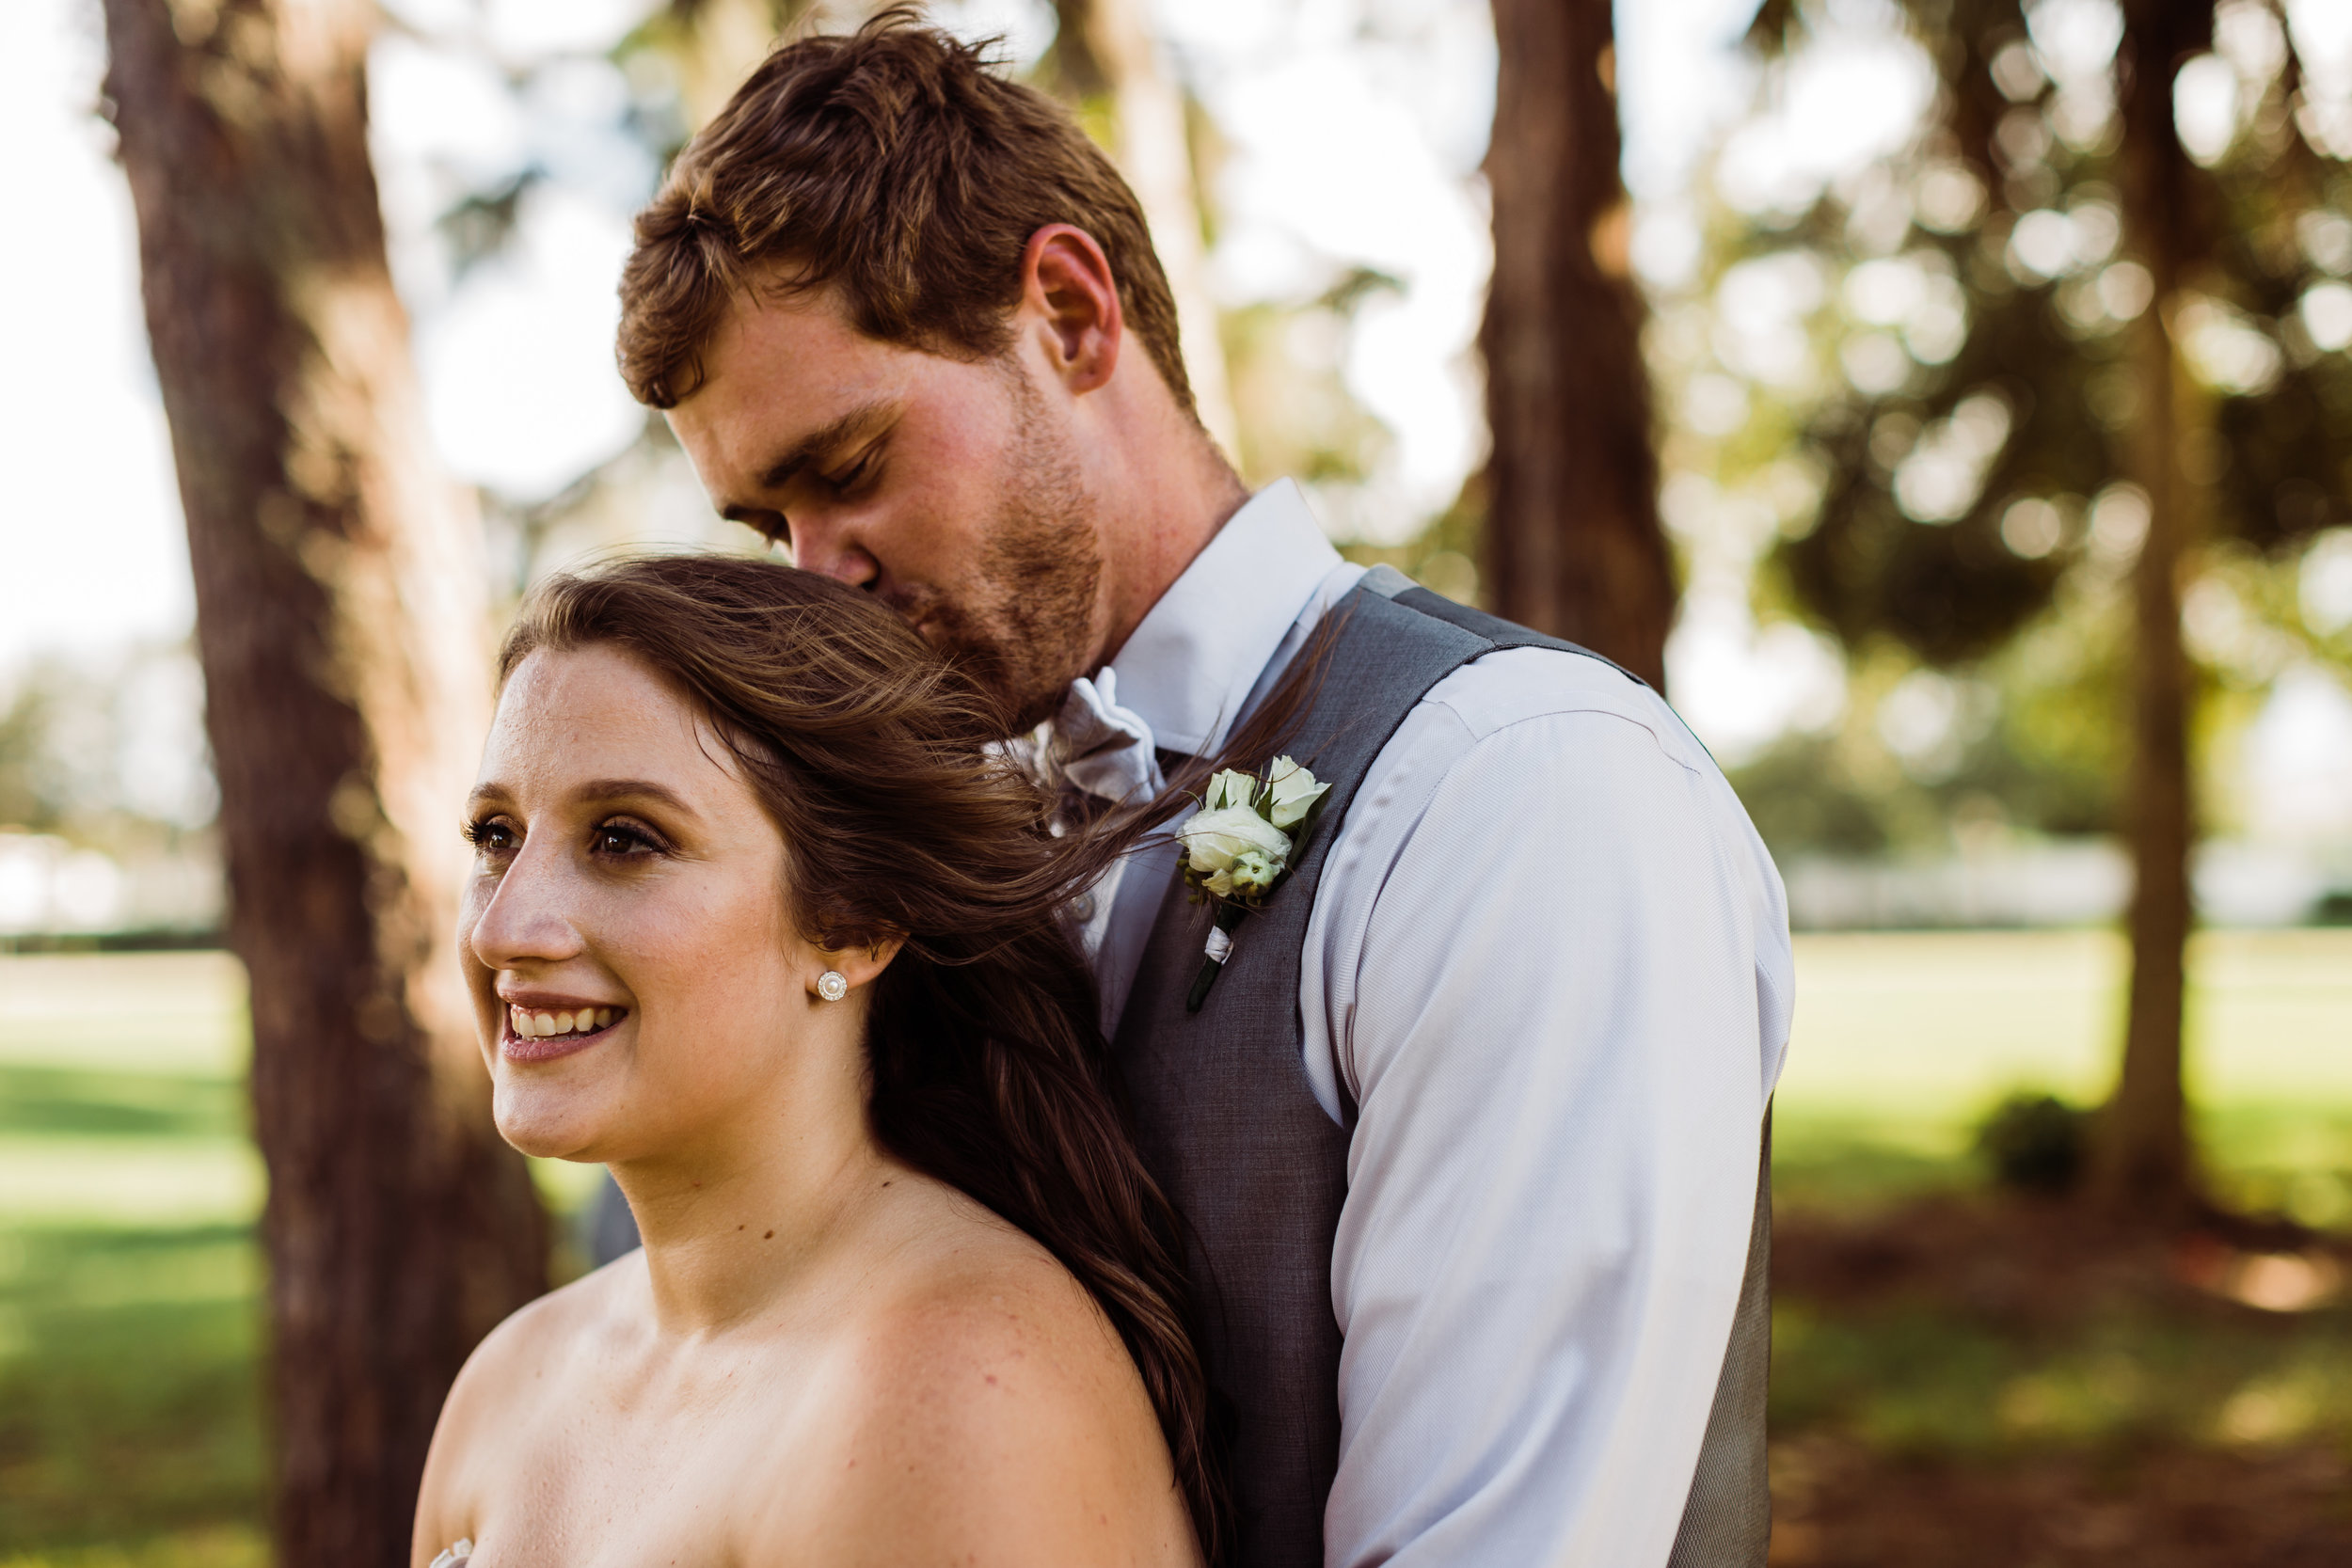 2017.10.14 Samantha and Matthew Crabtree Sarasota Wedding (329 of 708).jpg